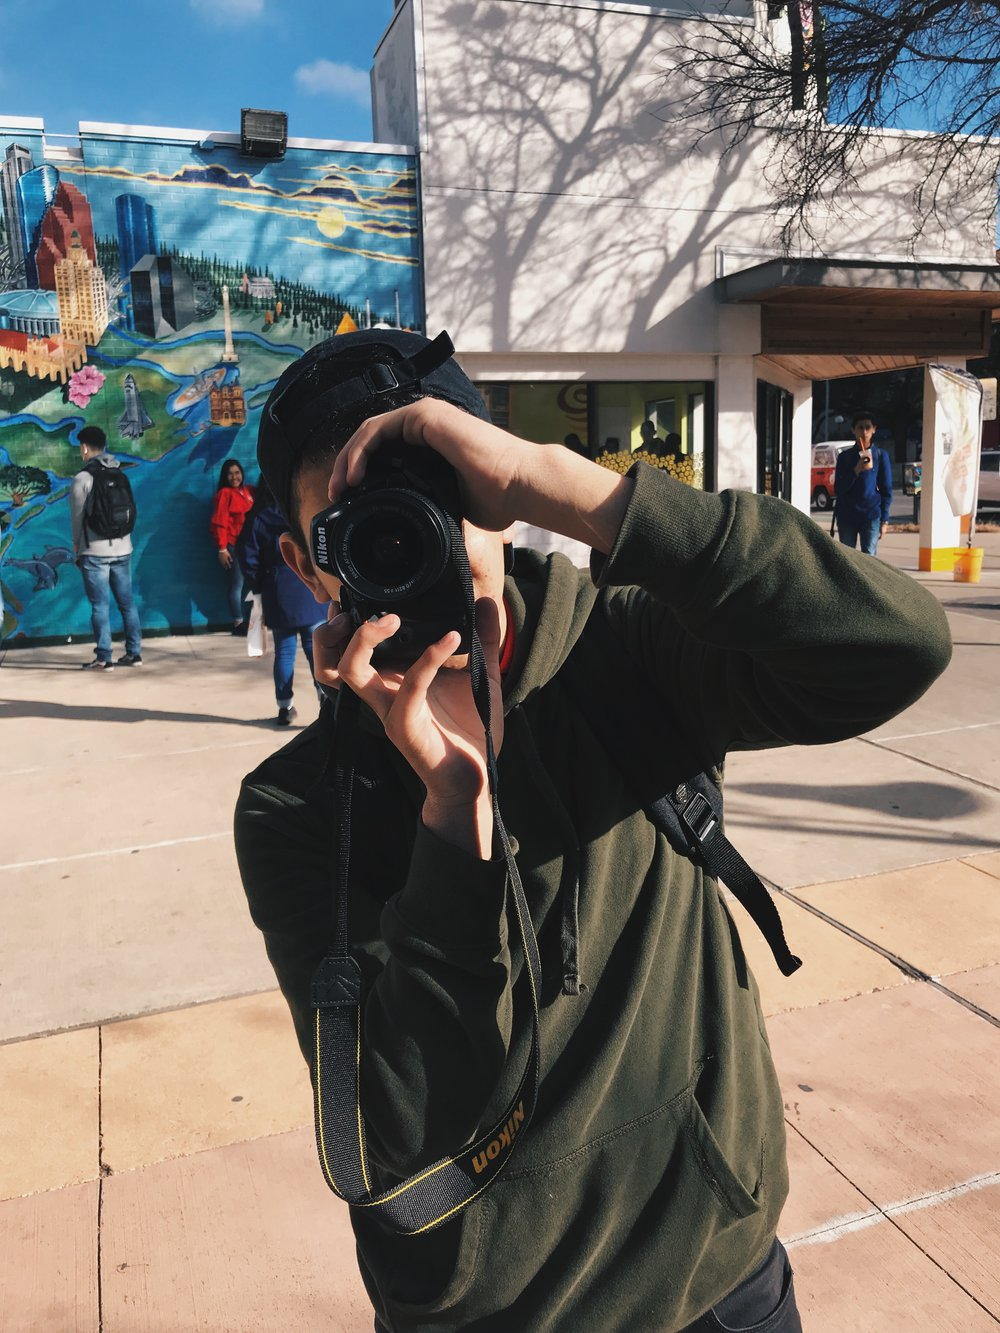 EDUARDO TREVIÑO | PHOTOGRAPHER - PORTRAIT / FILMMAKER